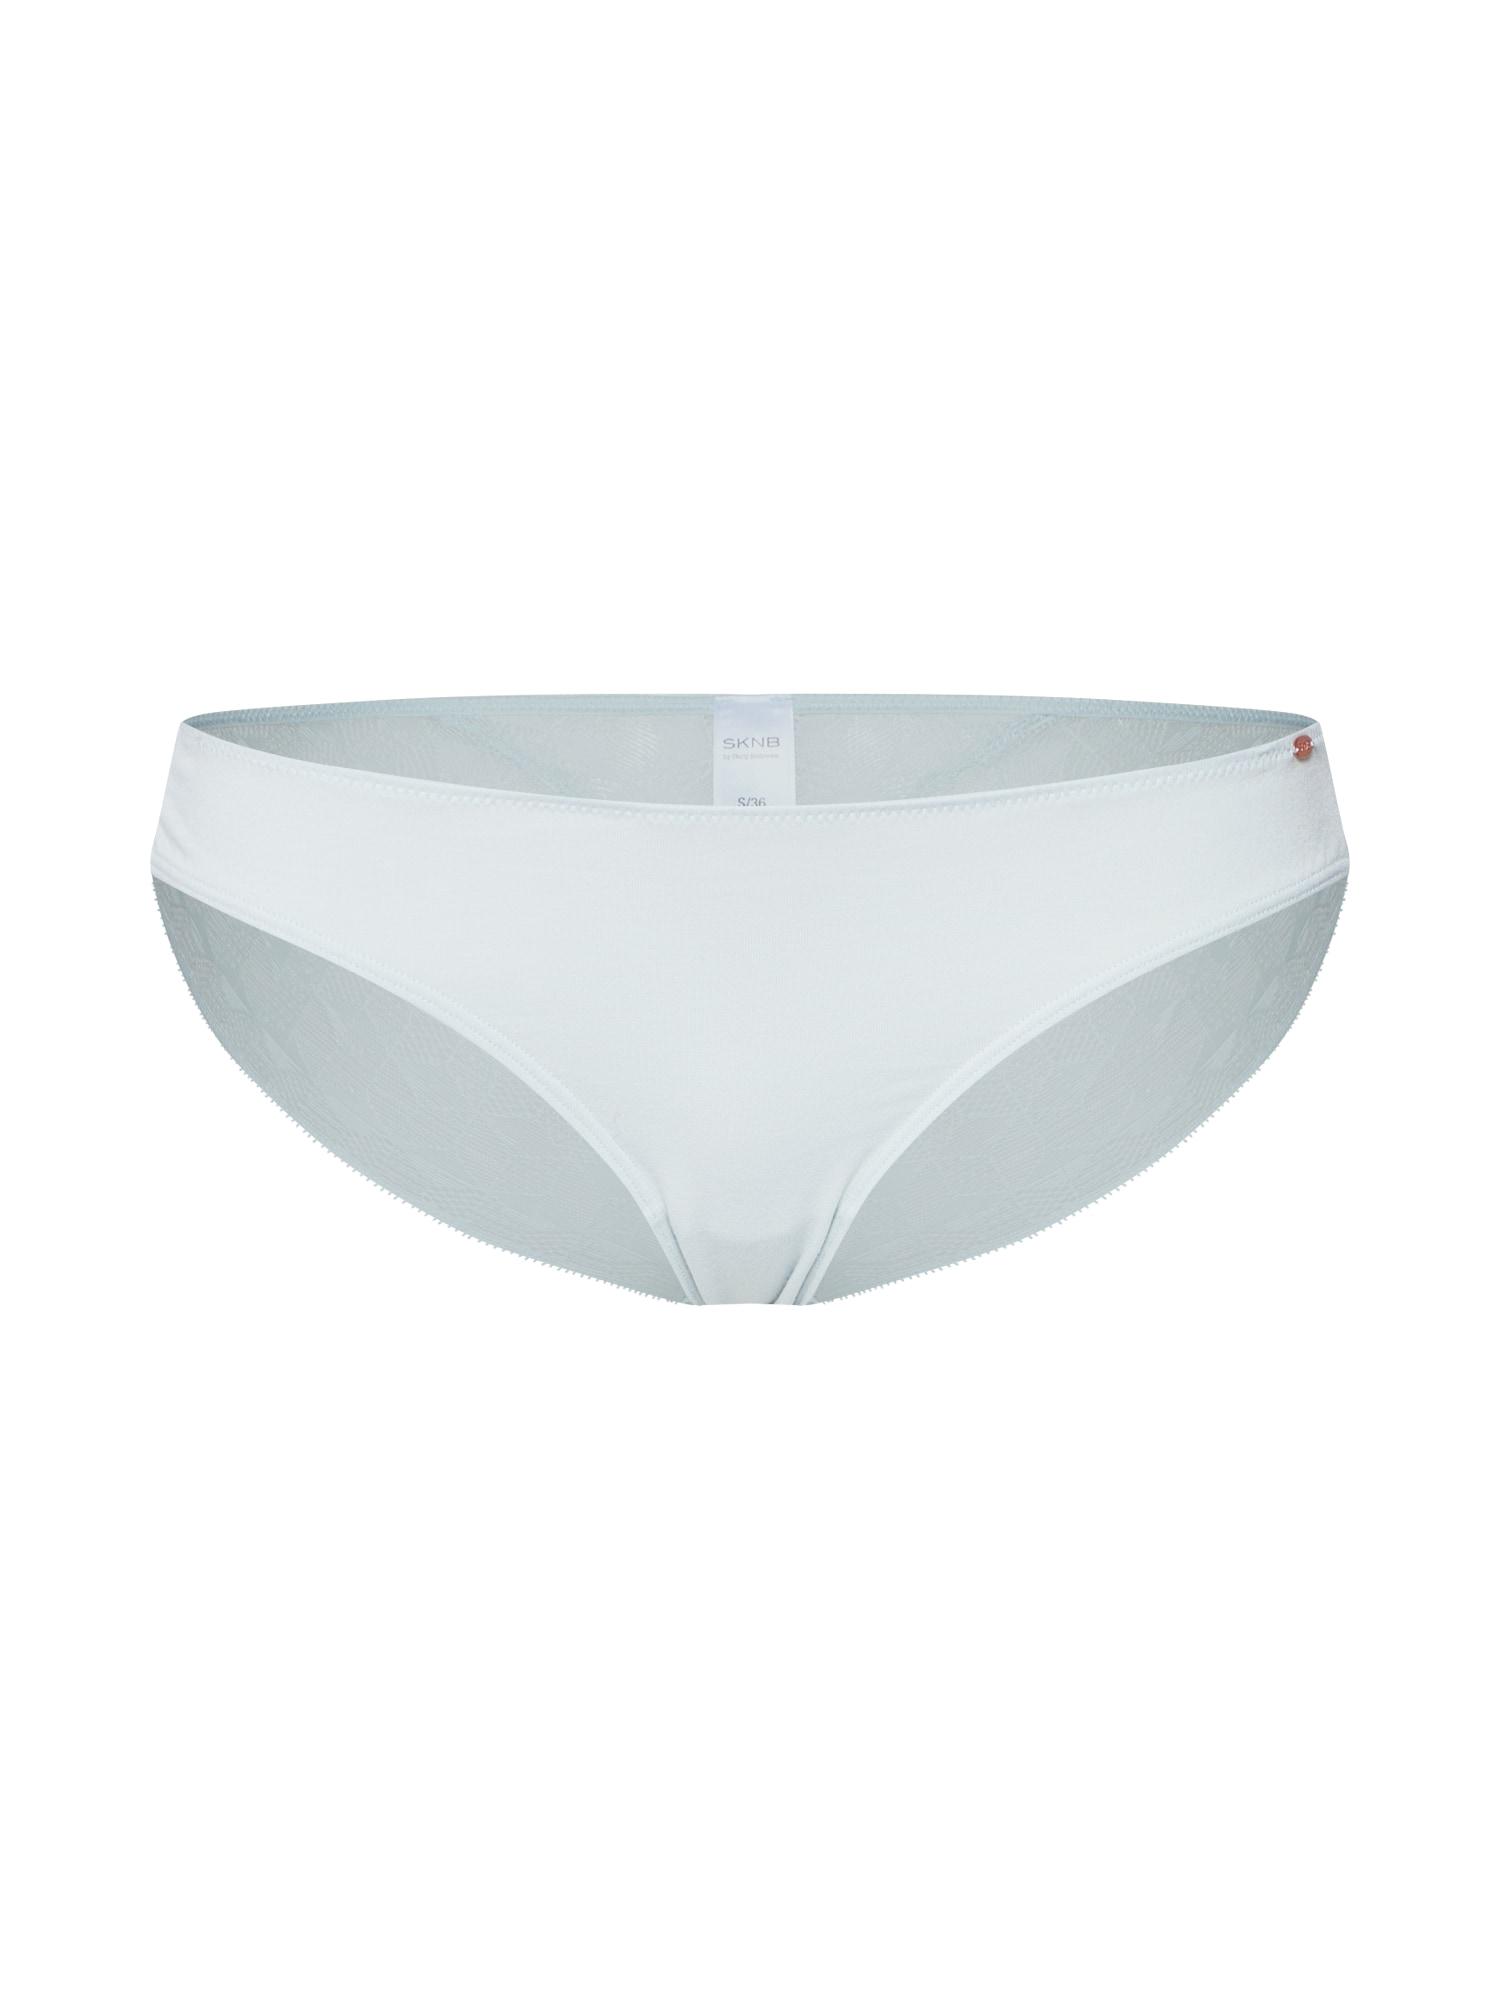 Kalhotky Cotton Graphic Rio mátová Skiny